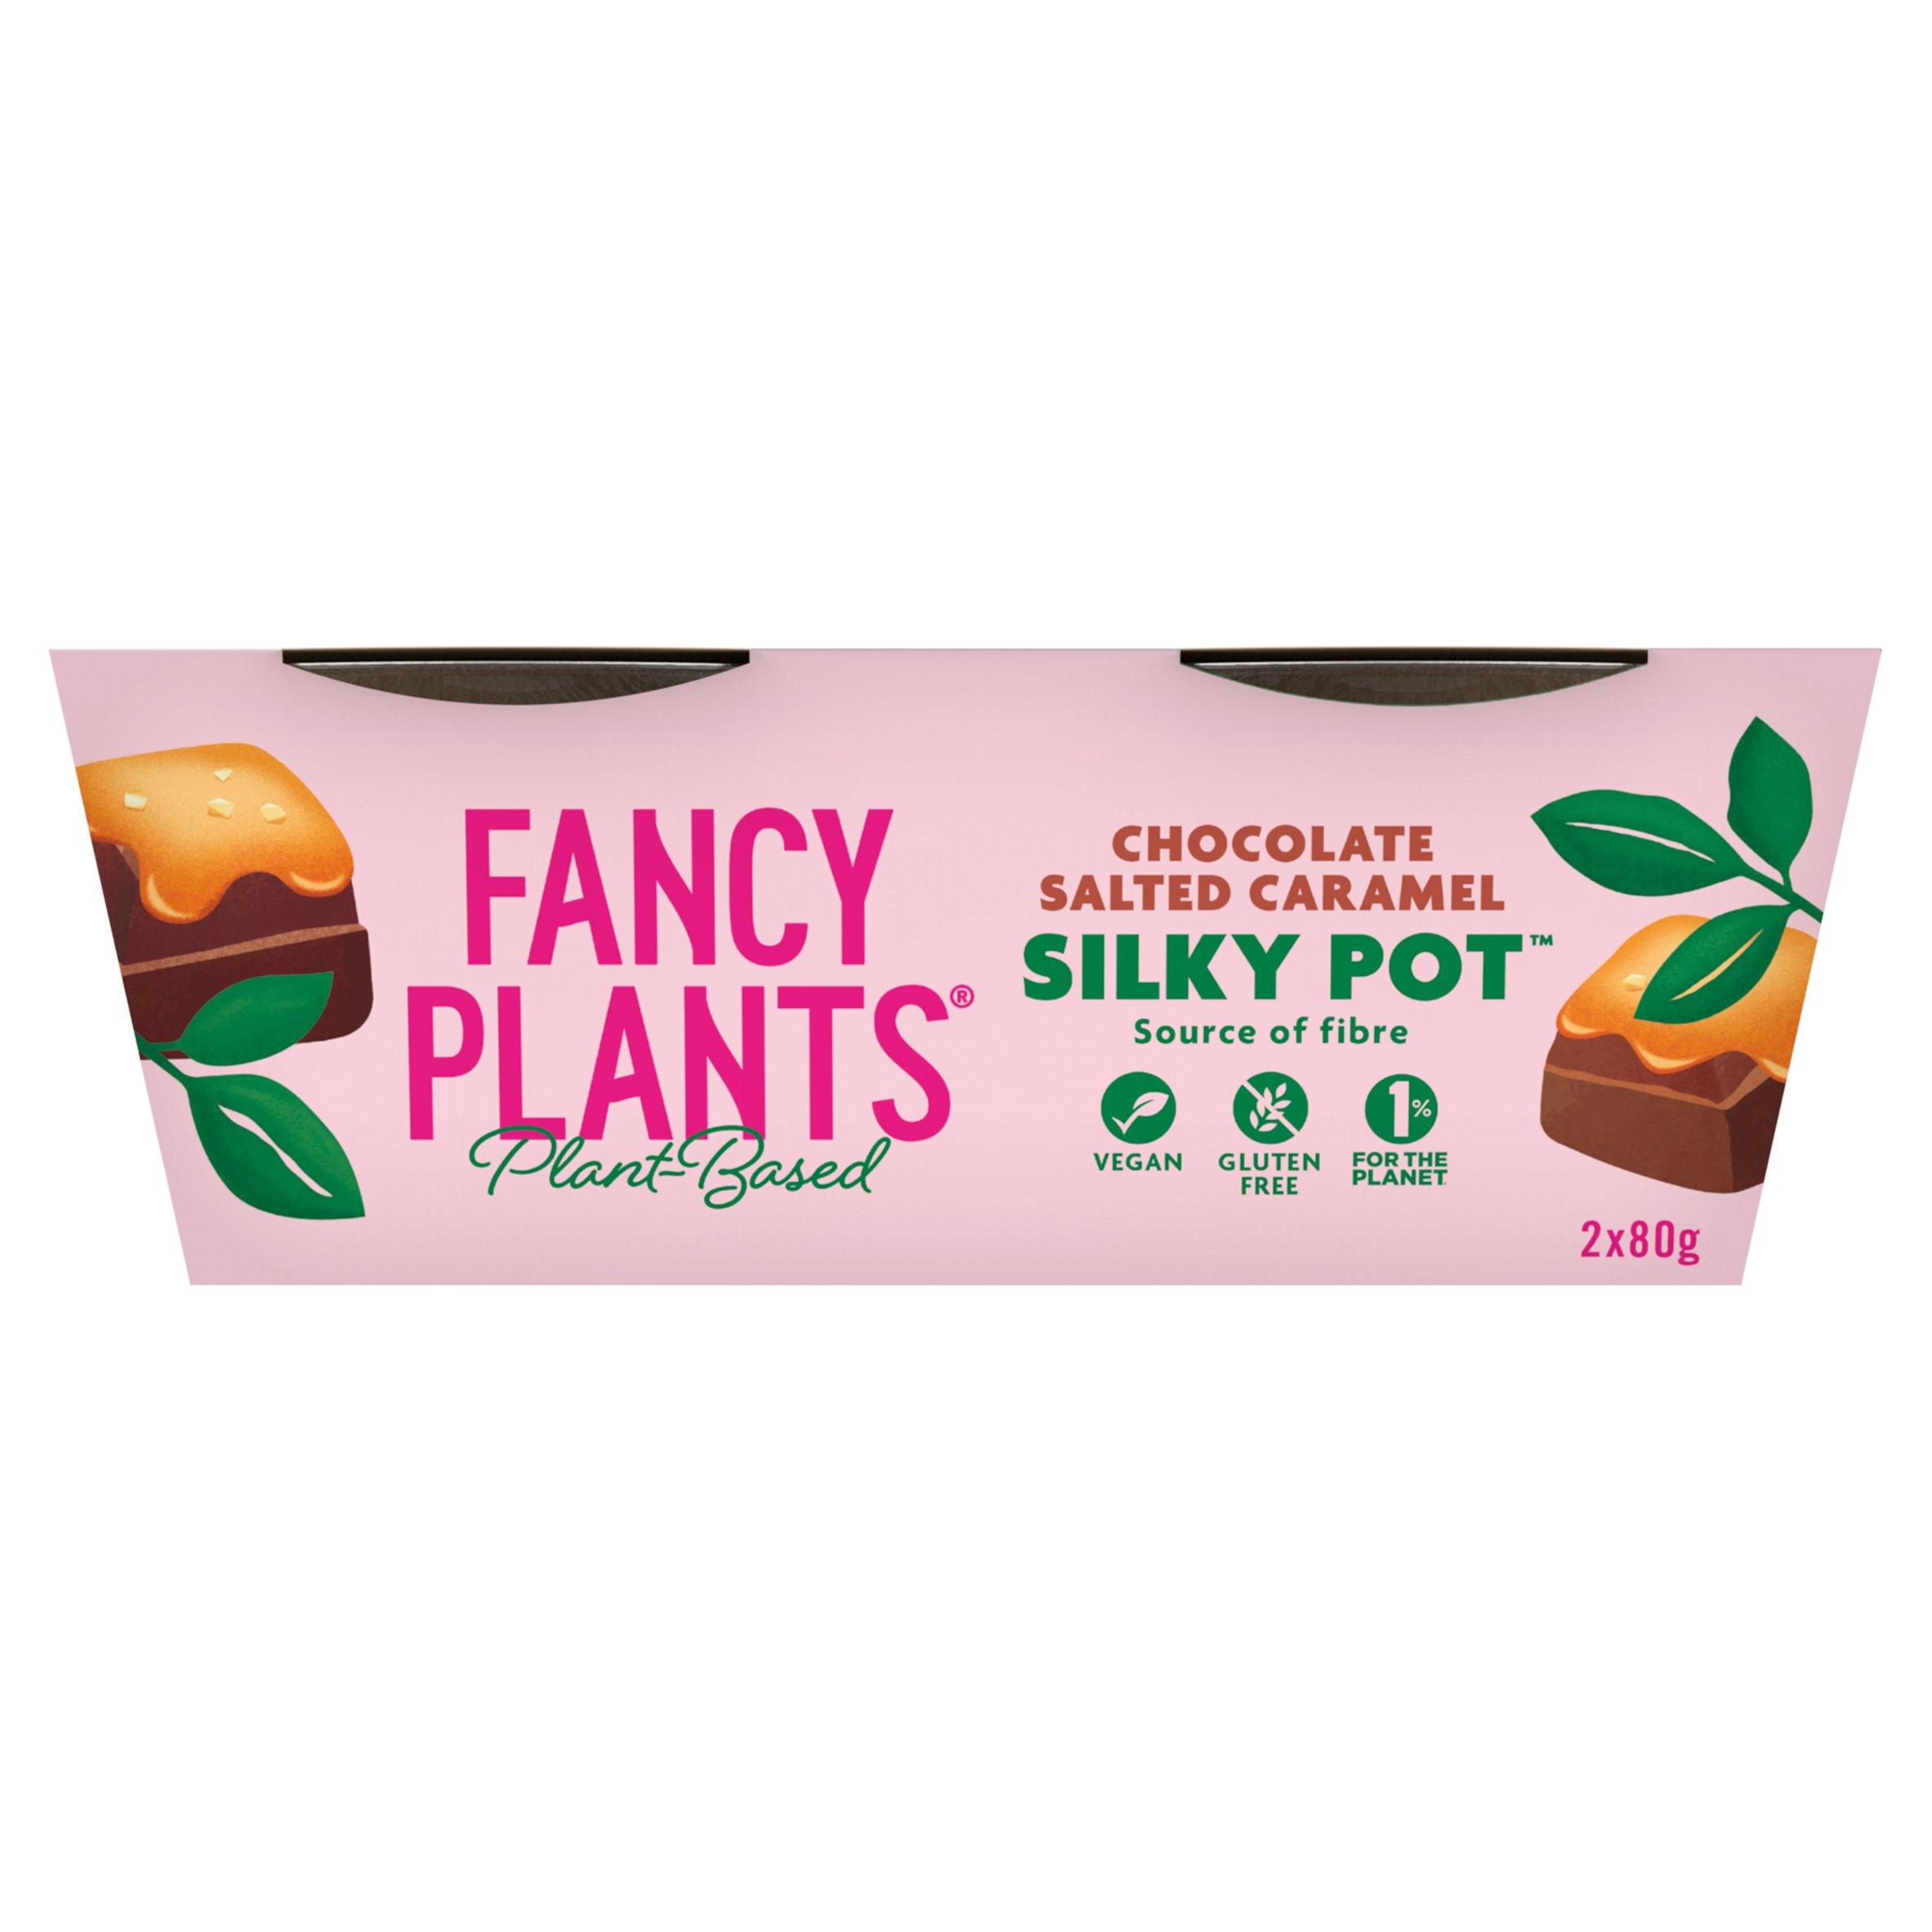 Fancy Plants Chocolate Salted Caramel Silky Pot 2X80g